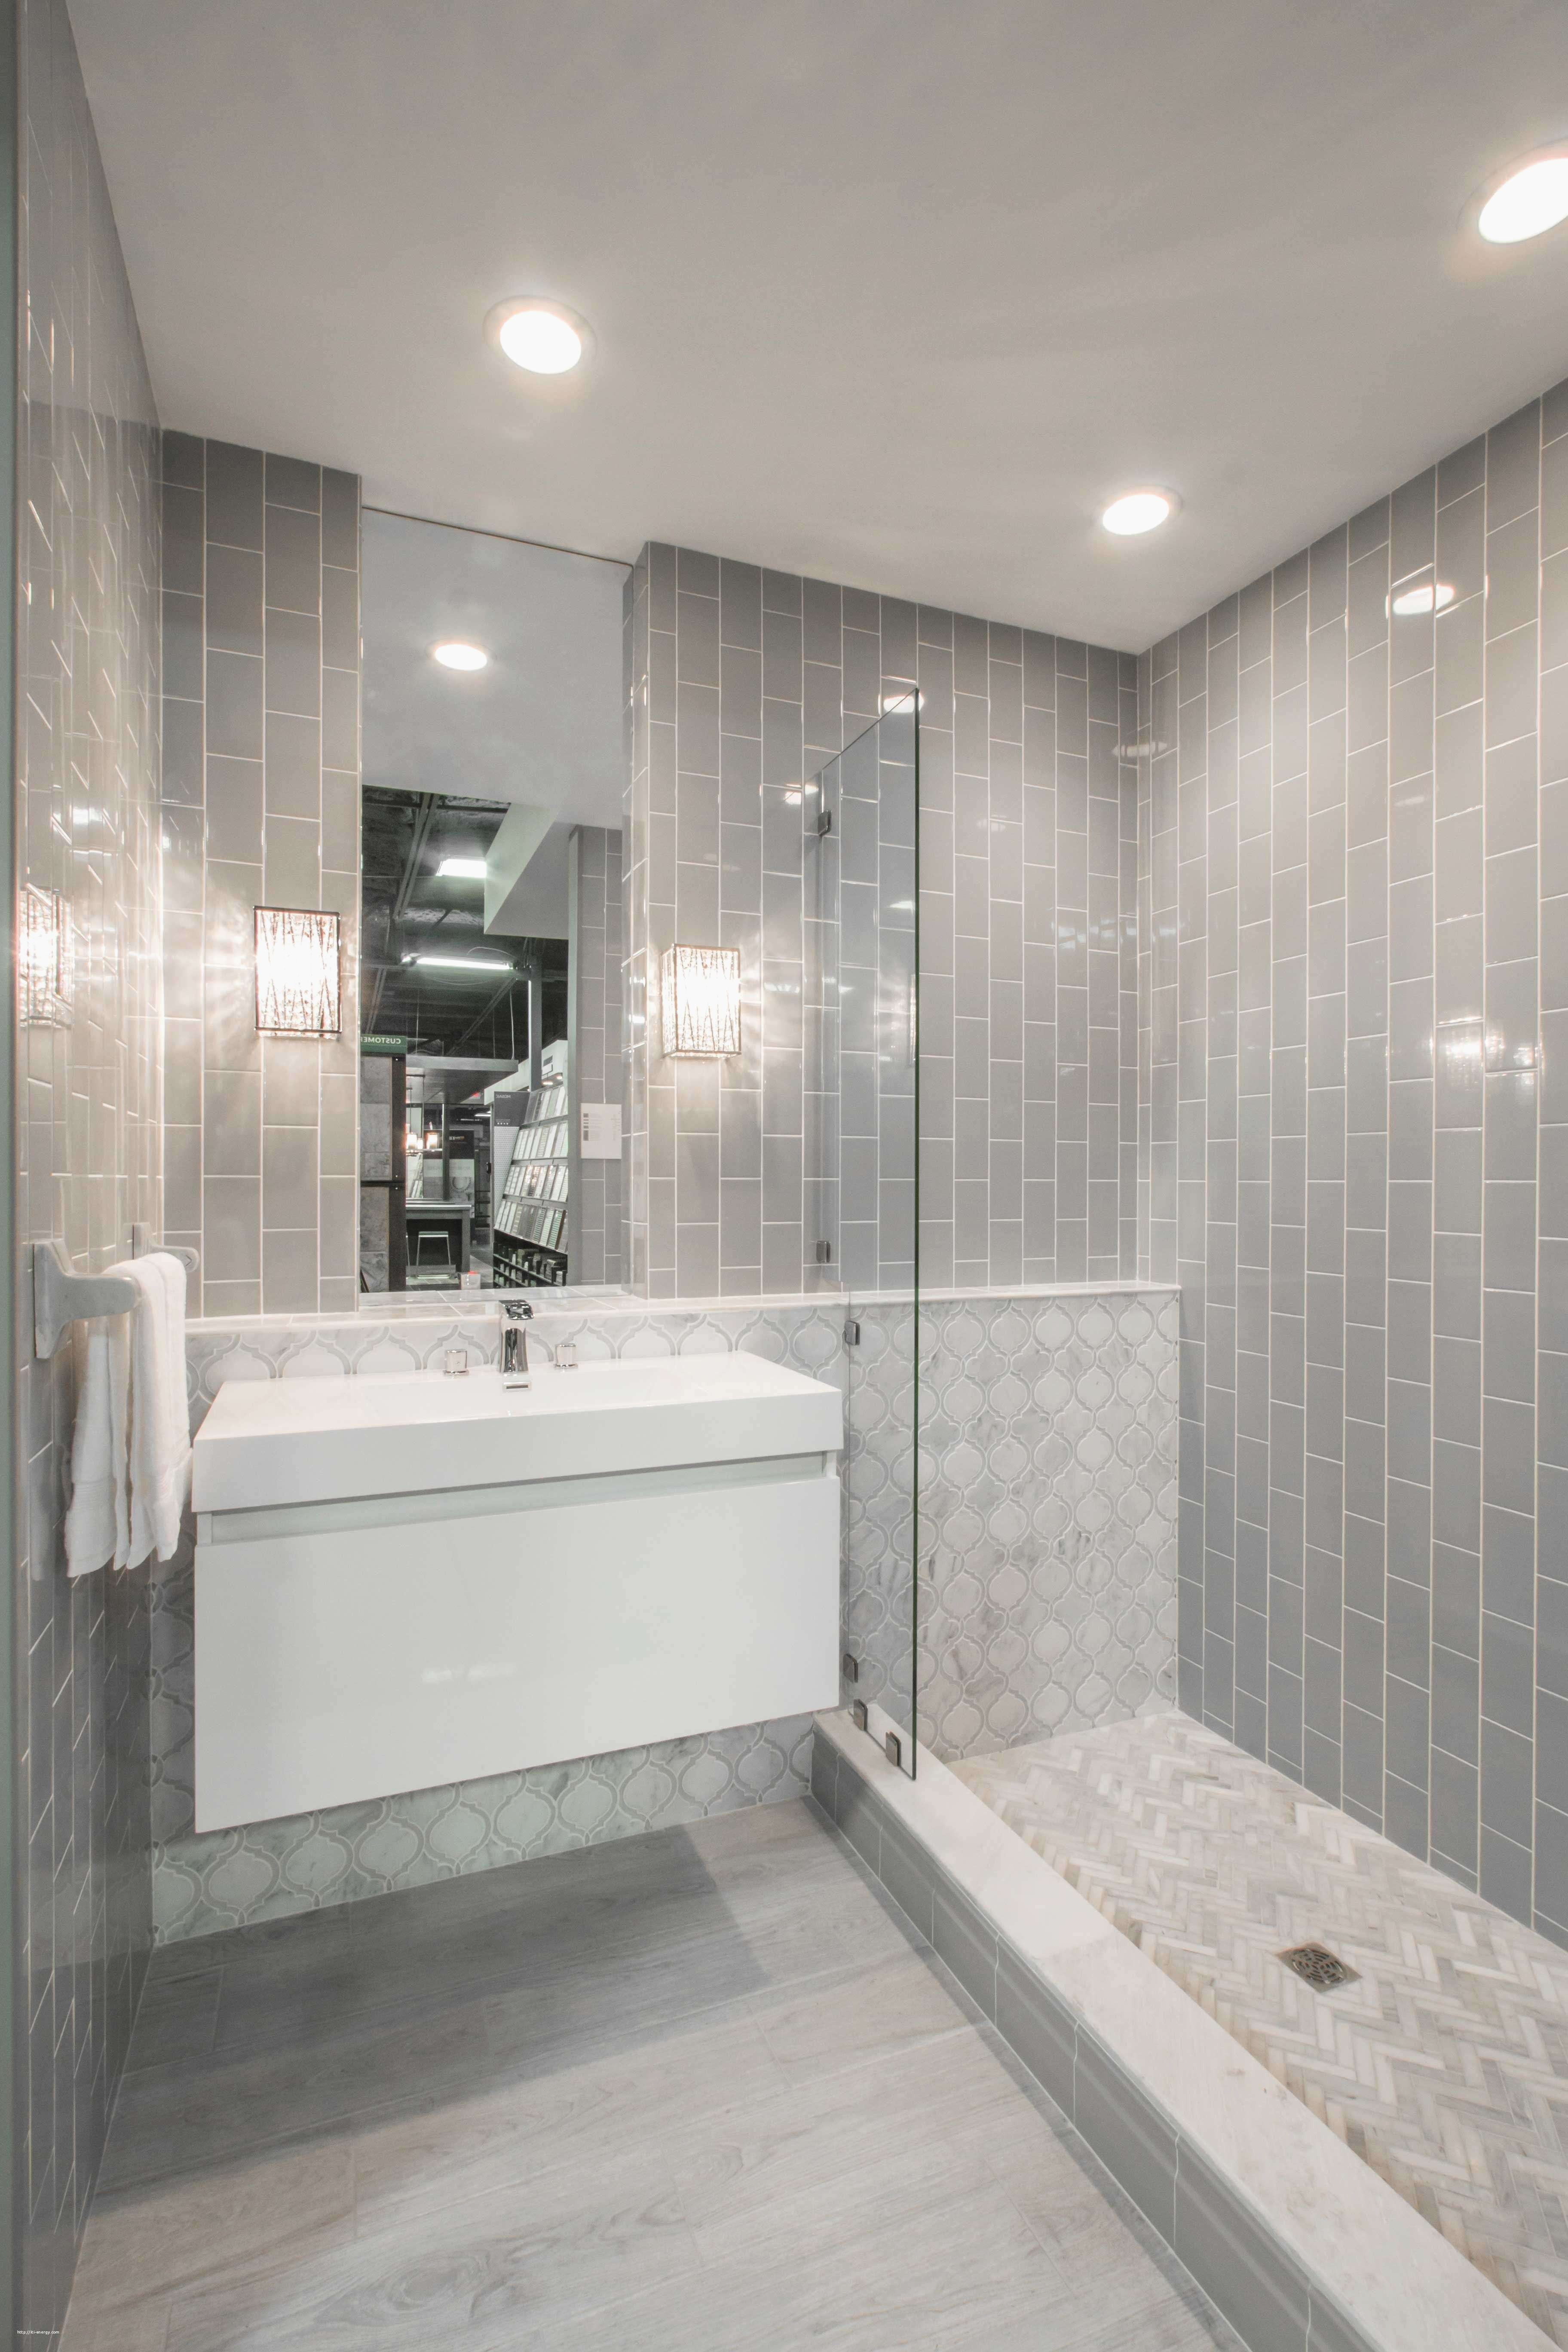 12 Small Modern Bathroom Design Elegant And Neat Modern Bathroom Remodel Bathroom Layout Modern Bathroom Design